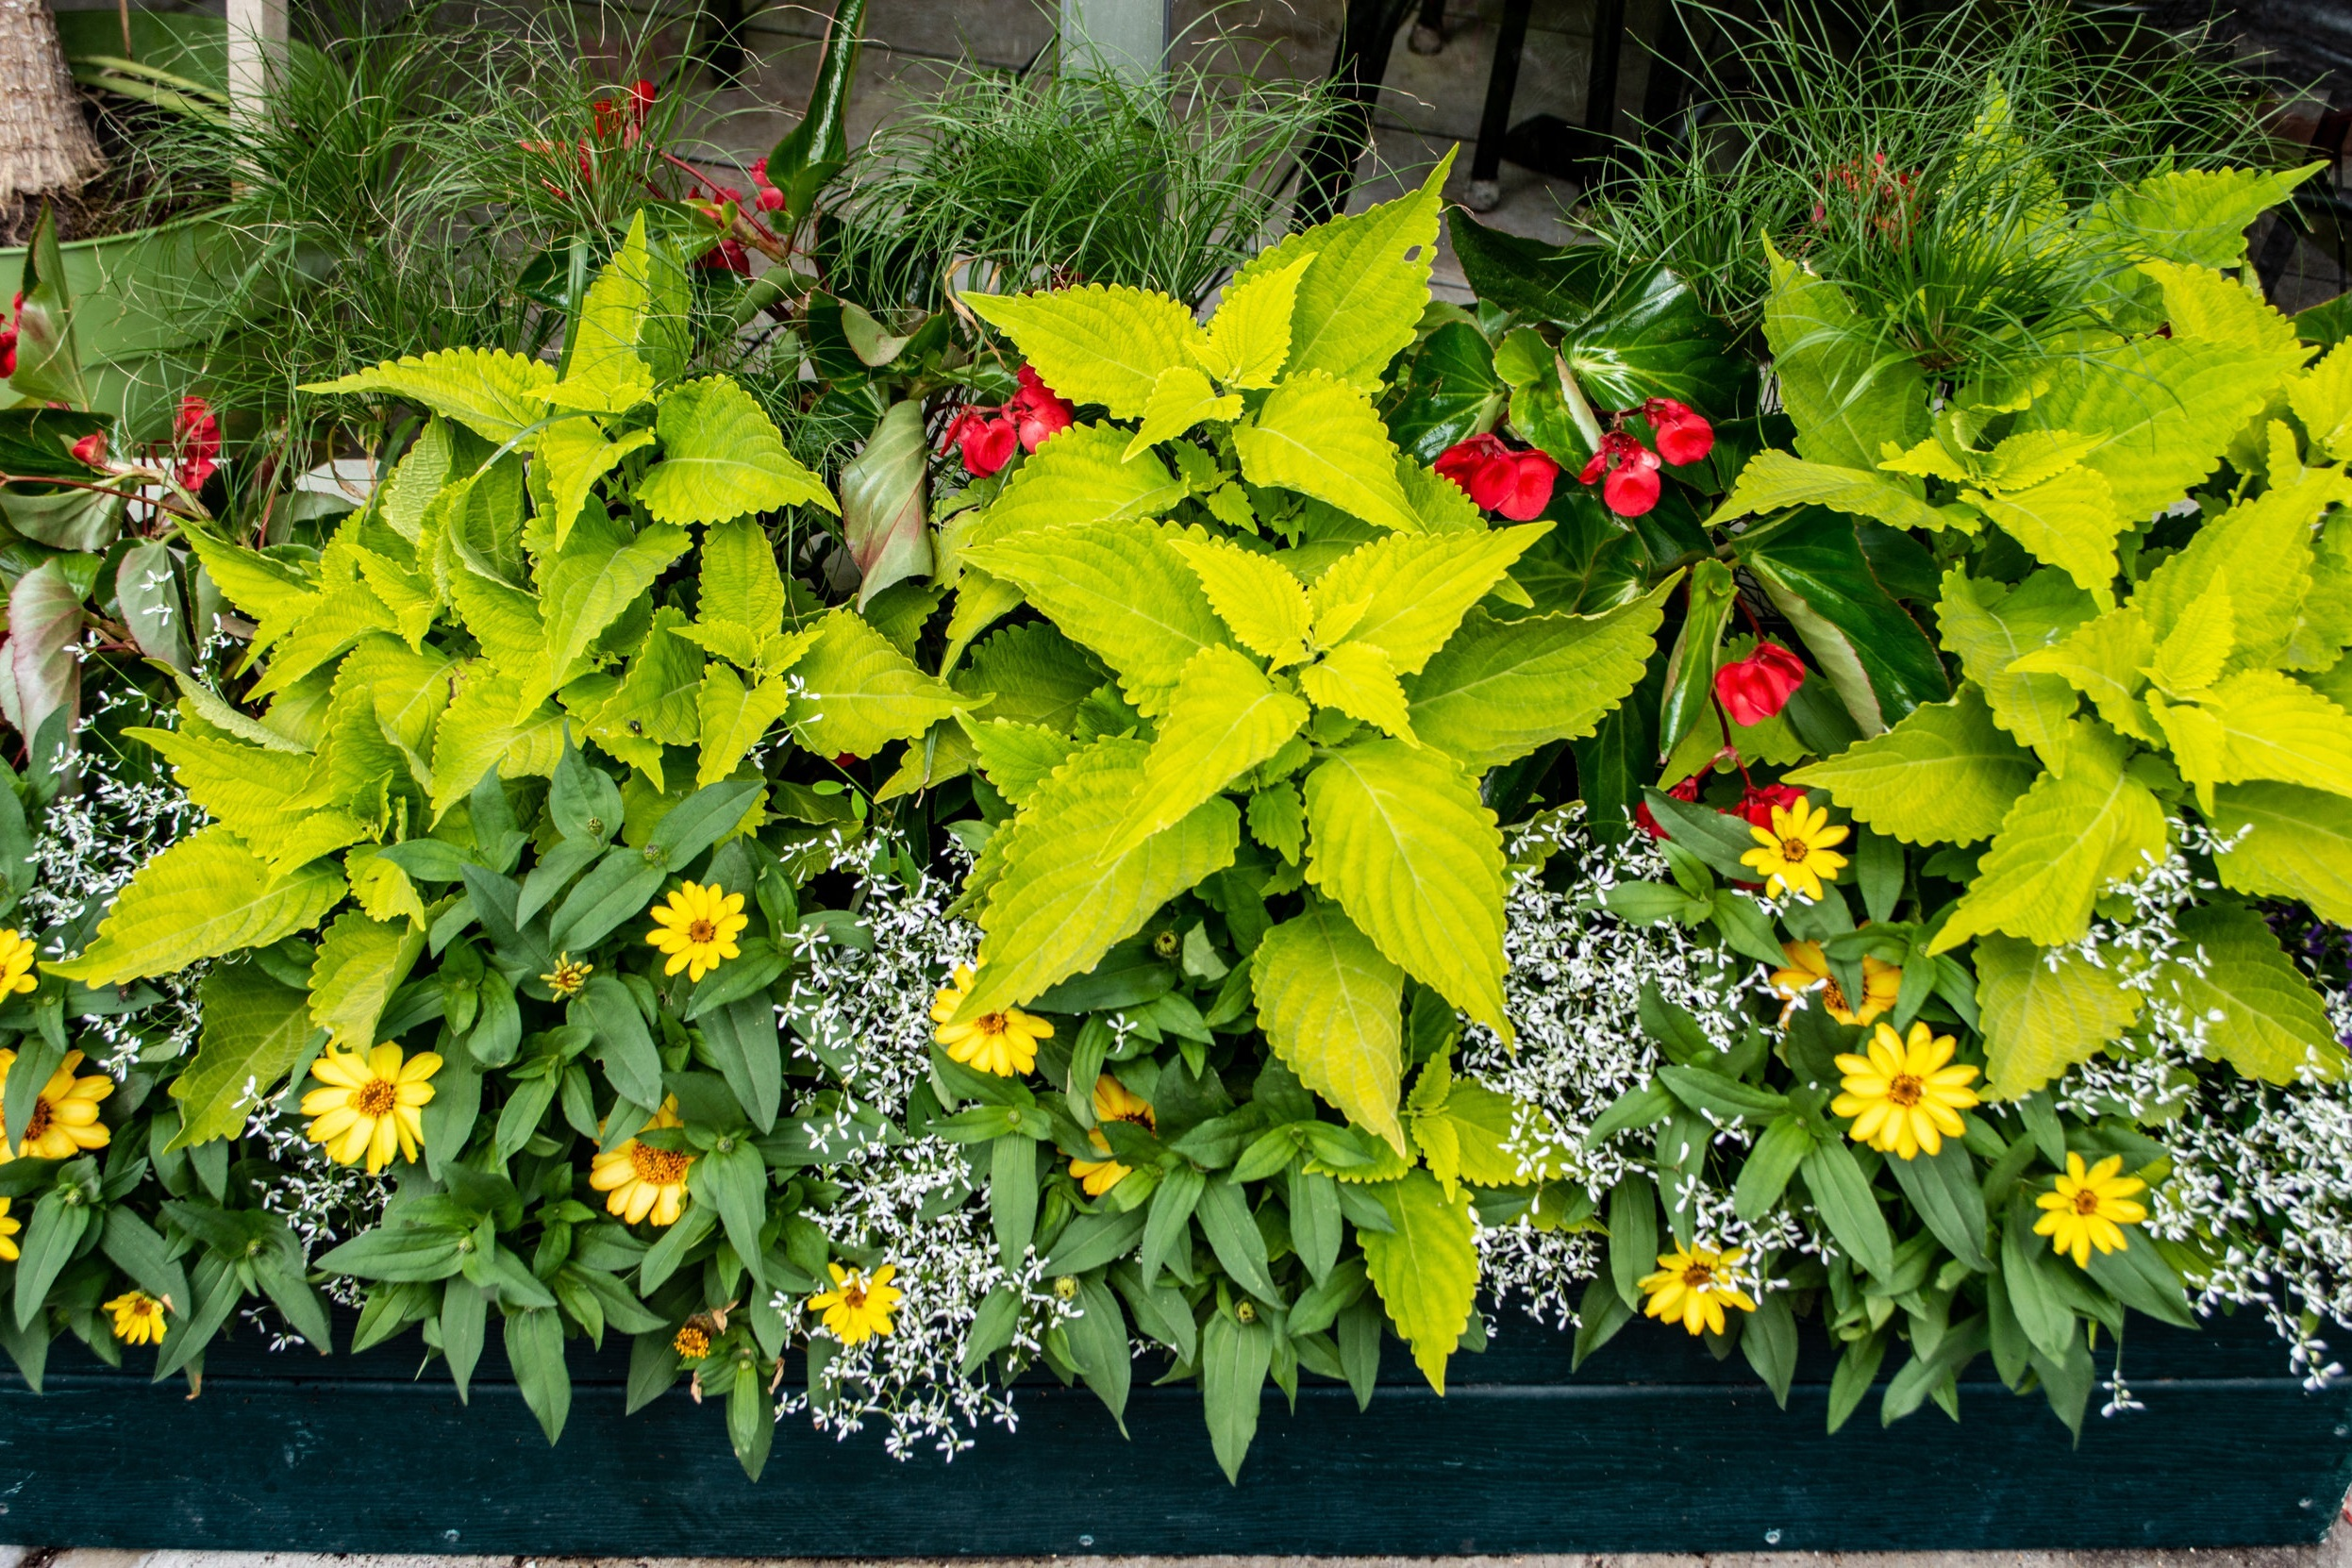 The Rutland Garden Club arranges plants in a box on Merchants Row in Downtown Rutland, Vermont.